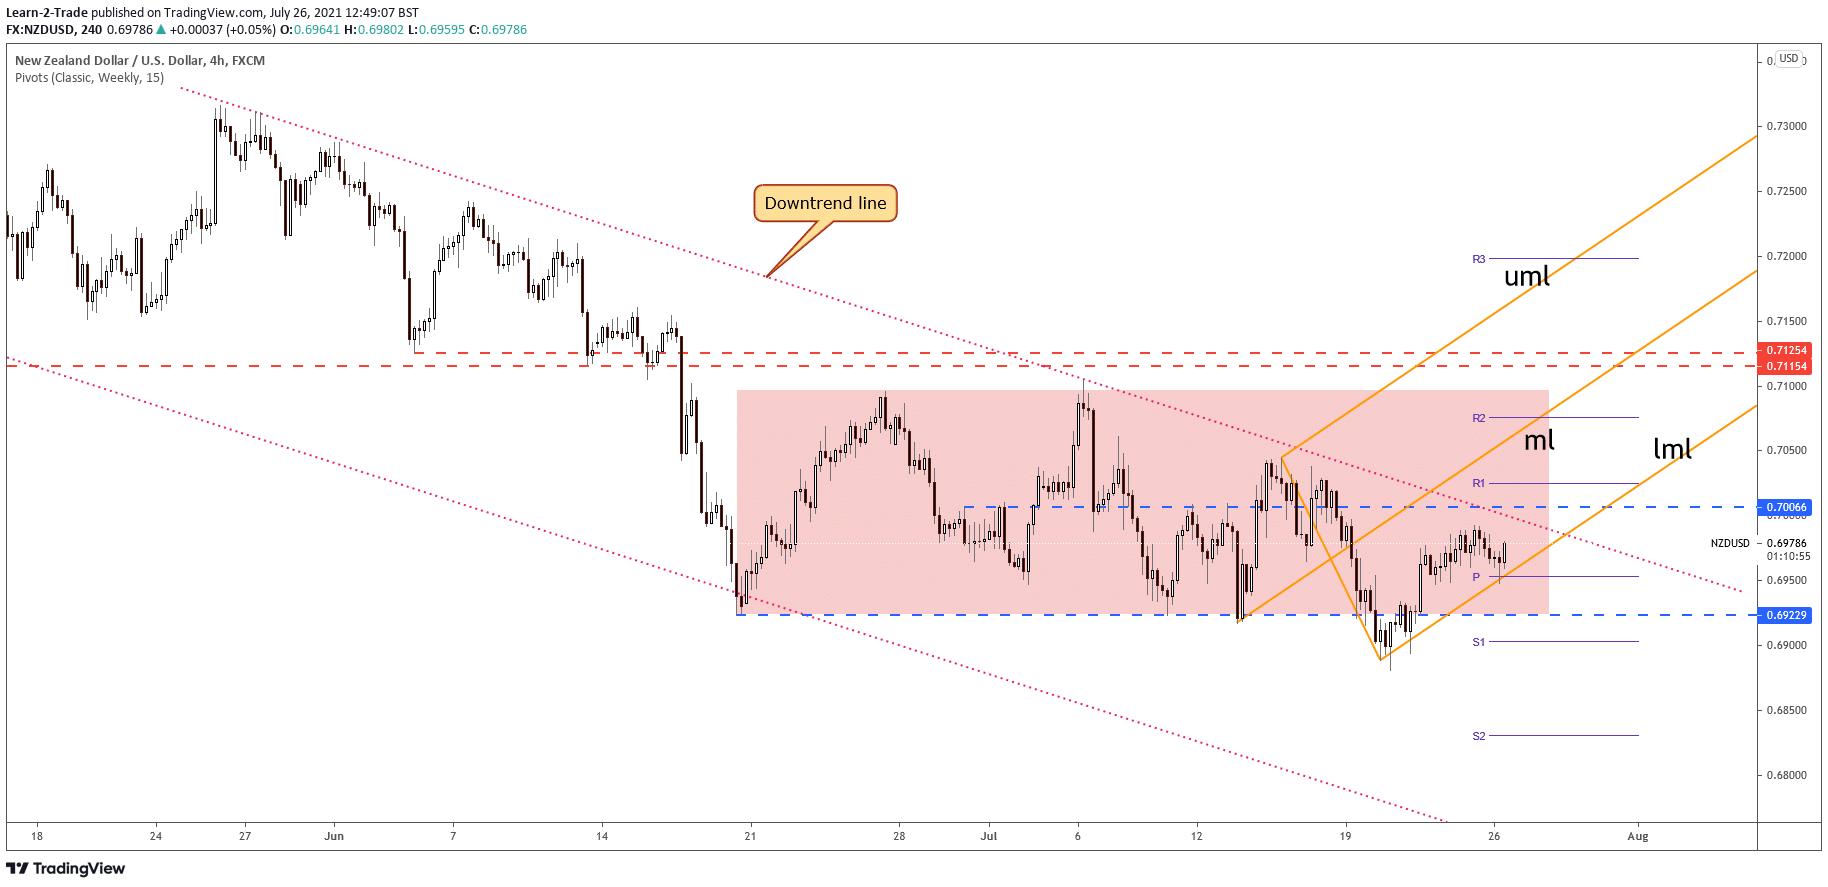 NZD/USD price on 4-hour chart